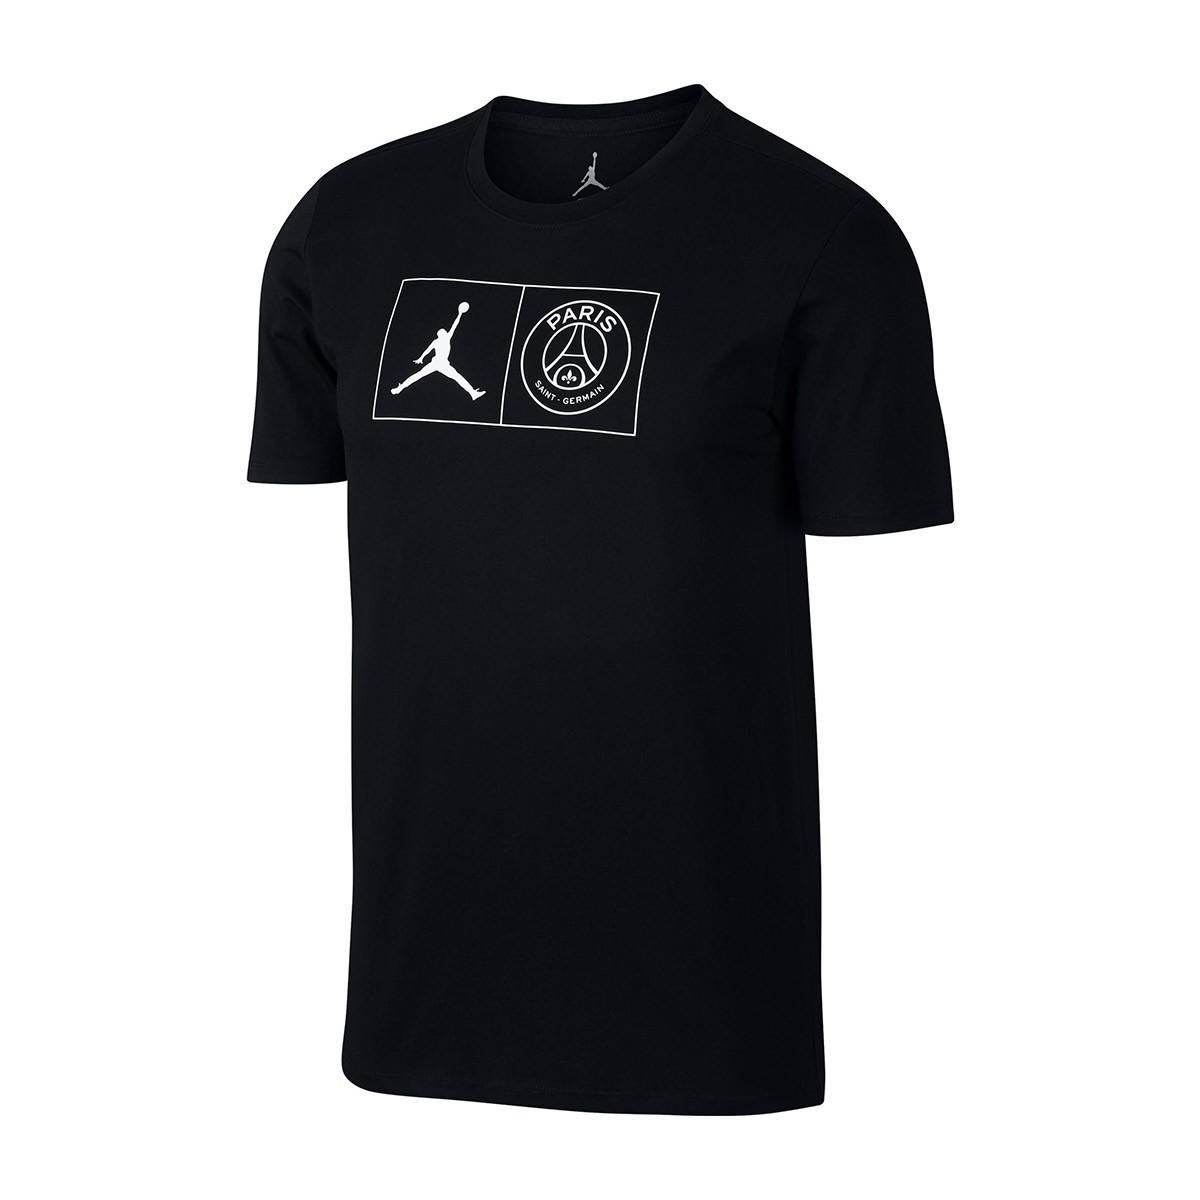 5bddffb72182 Nike Jordan Paris Saint Germain - PSG tričko čierne pánske